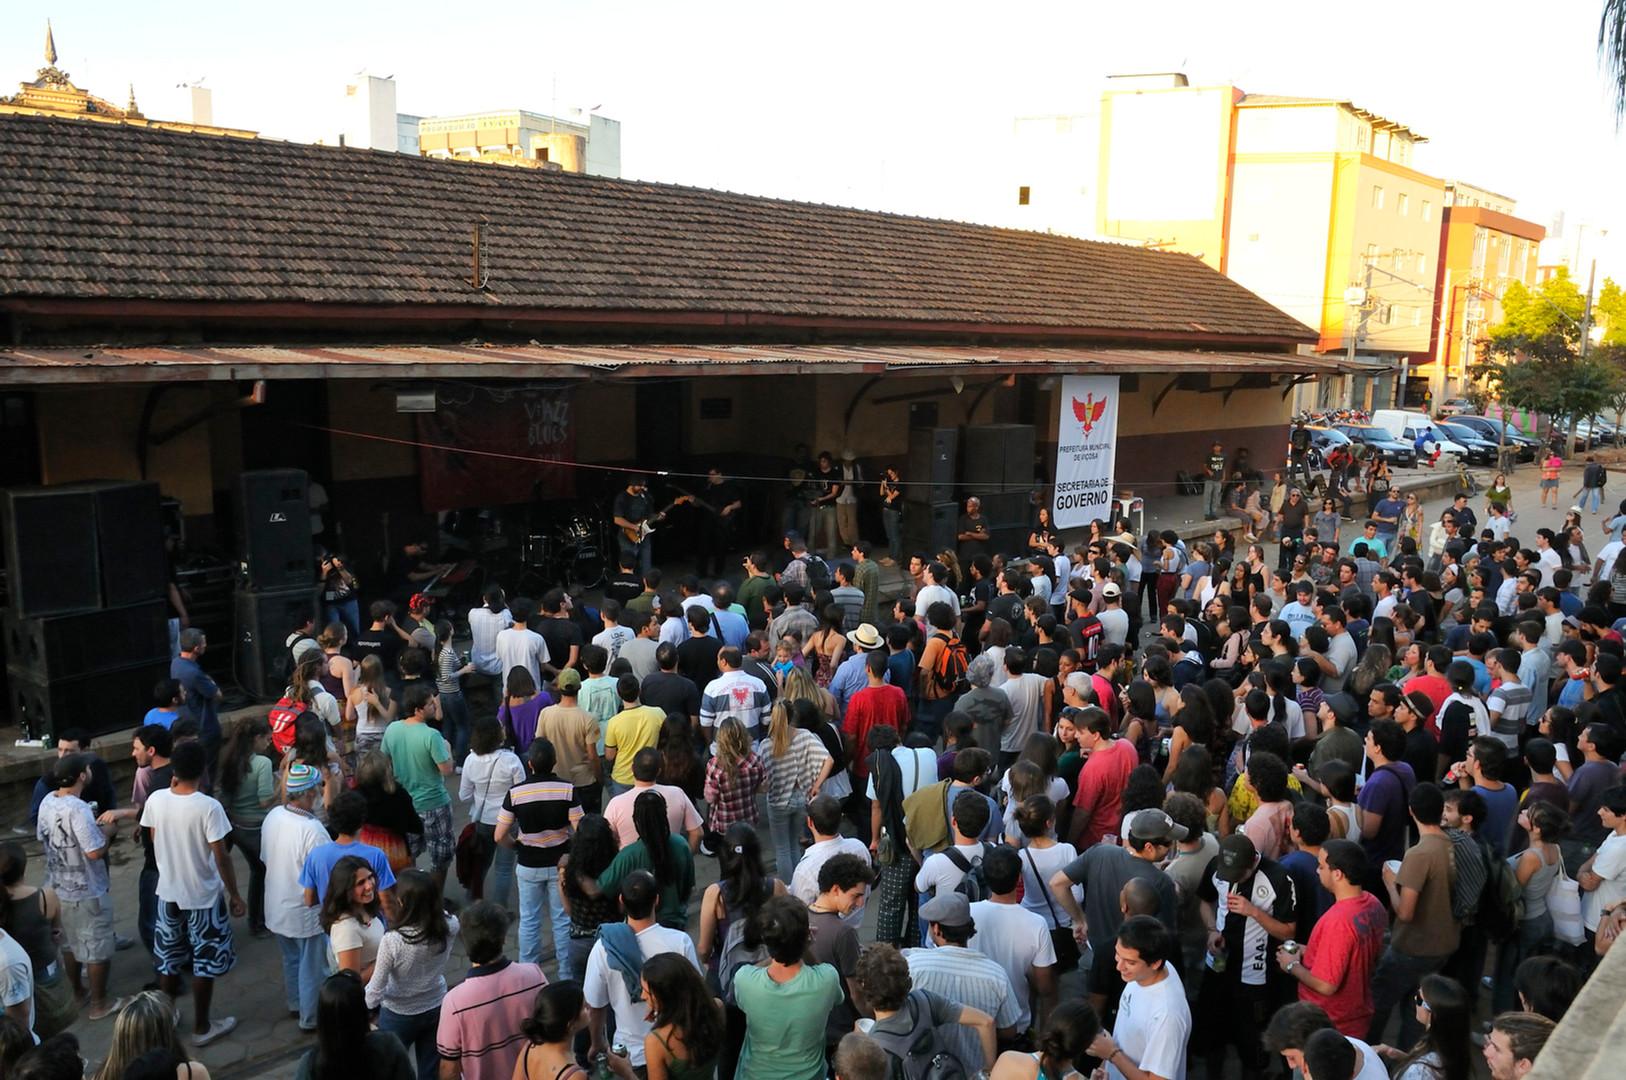 2011.06.18_ViJazz&Blues_Festival_REY2125